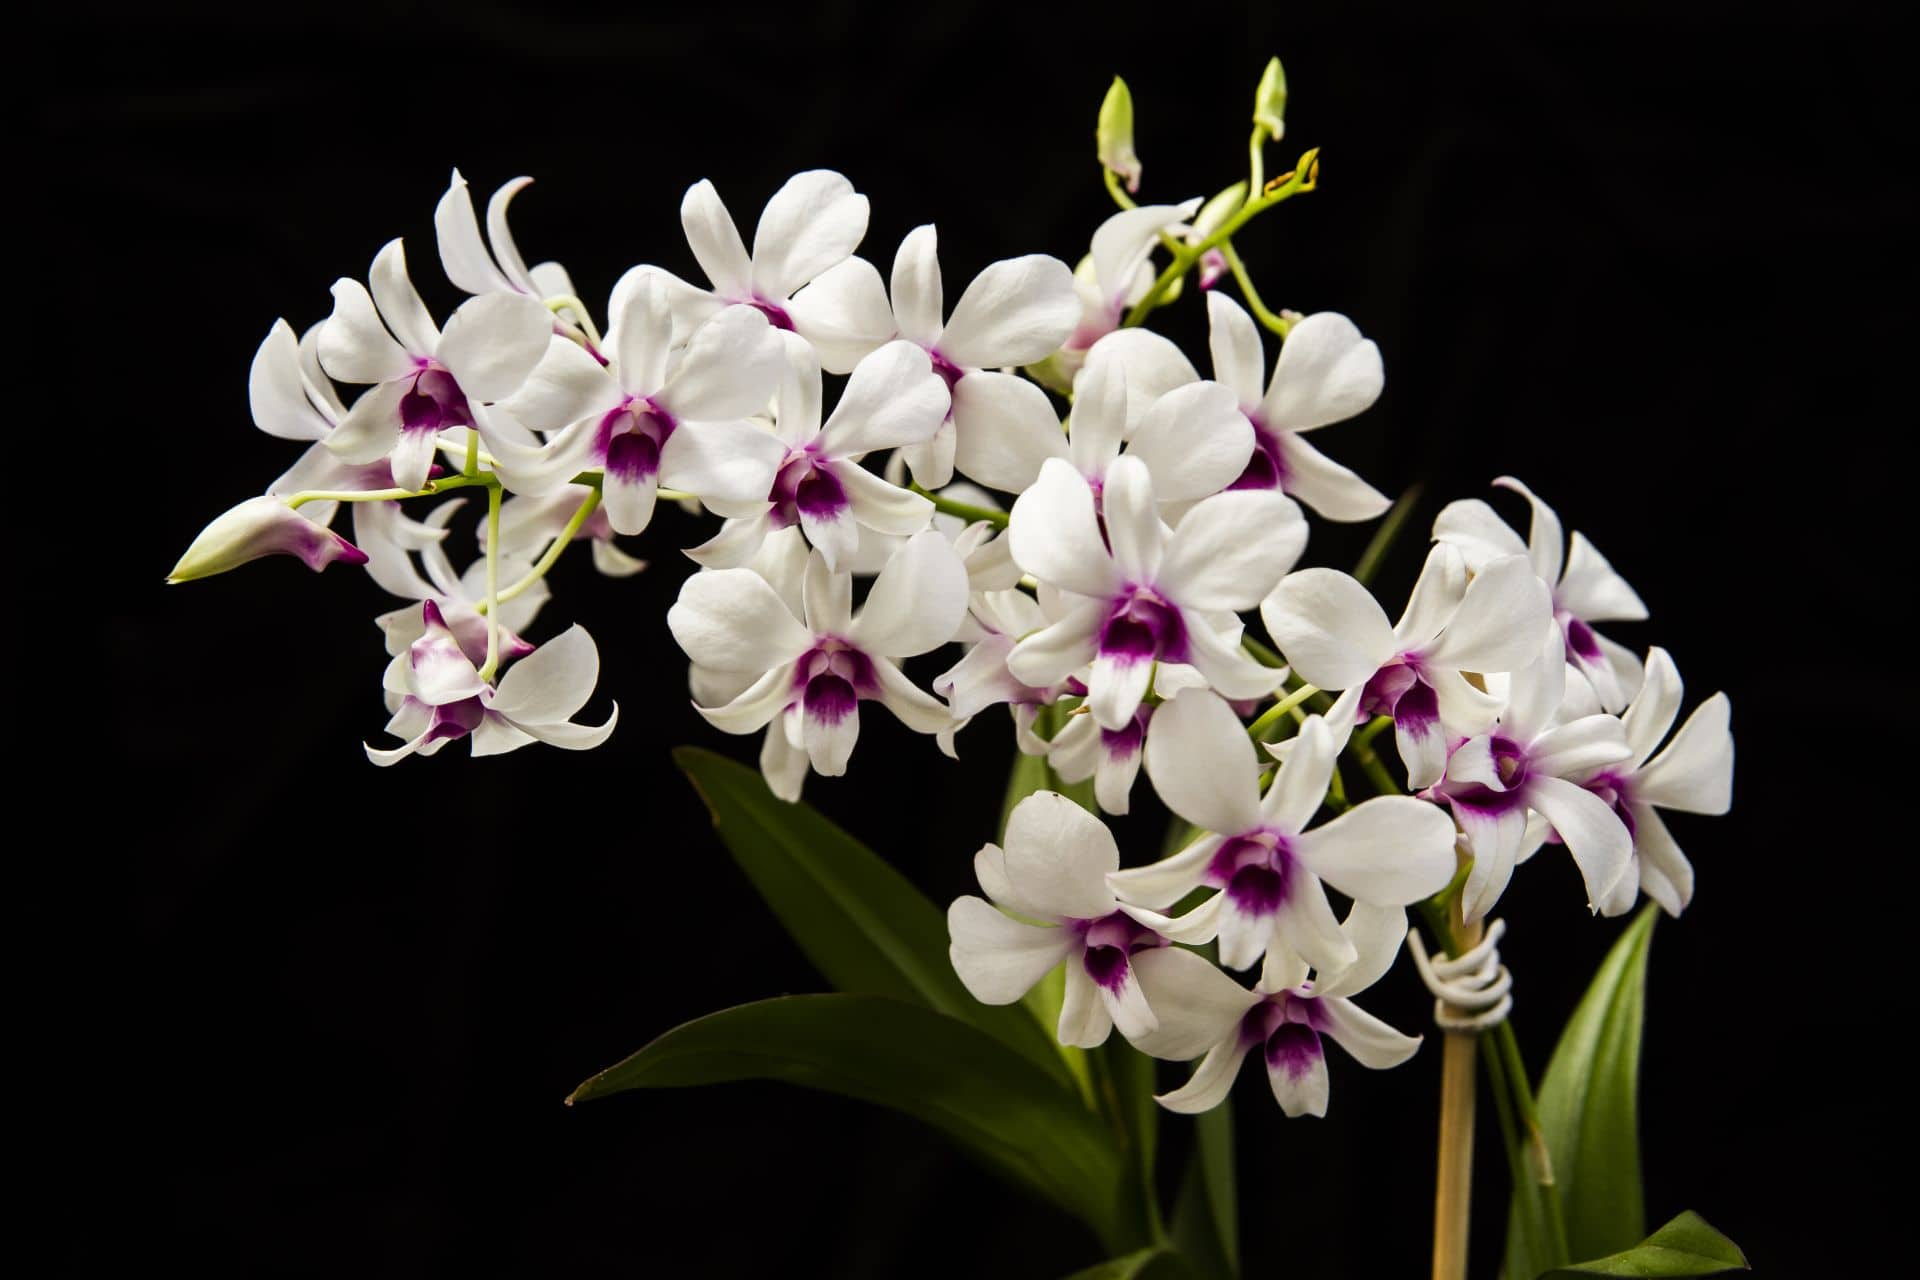 Como regar orquídeas envolve muito mitos e equívocos.